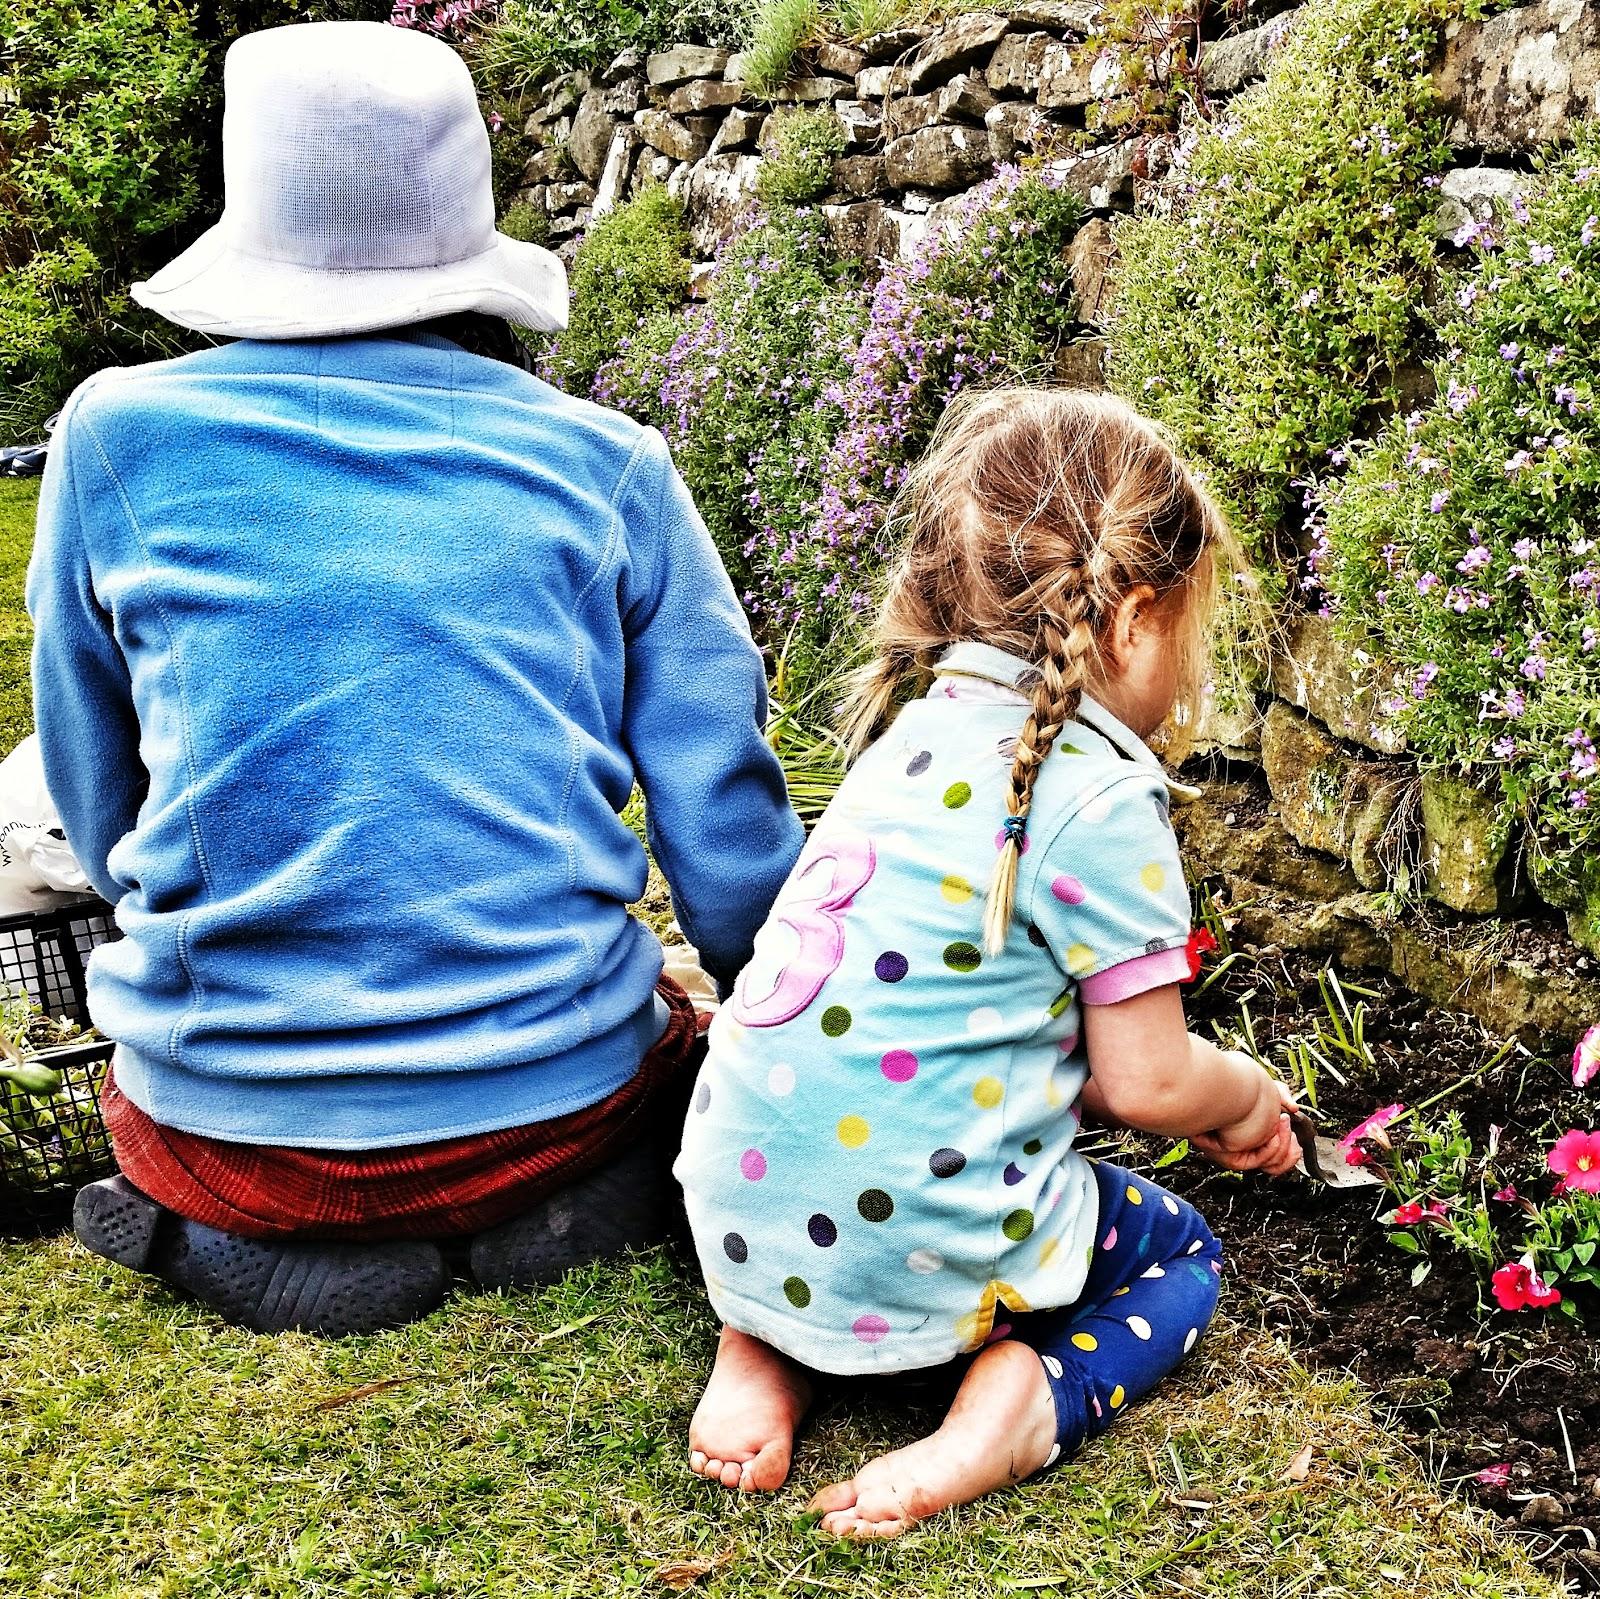 helping great-grandma in the garden